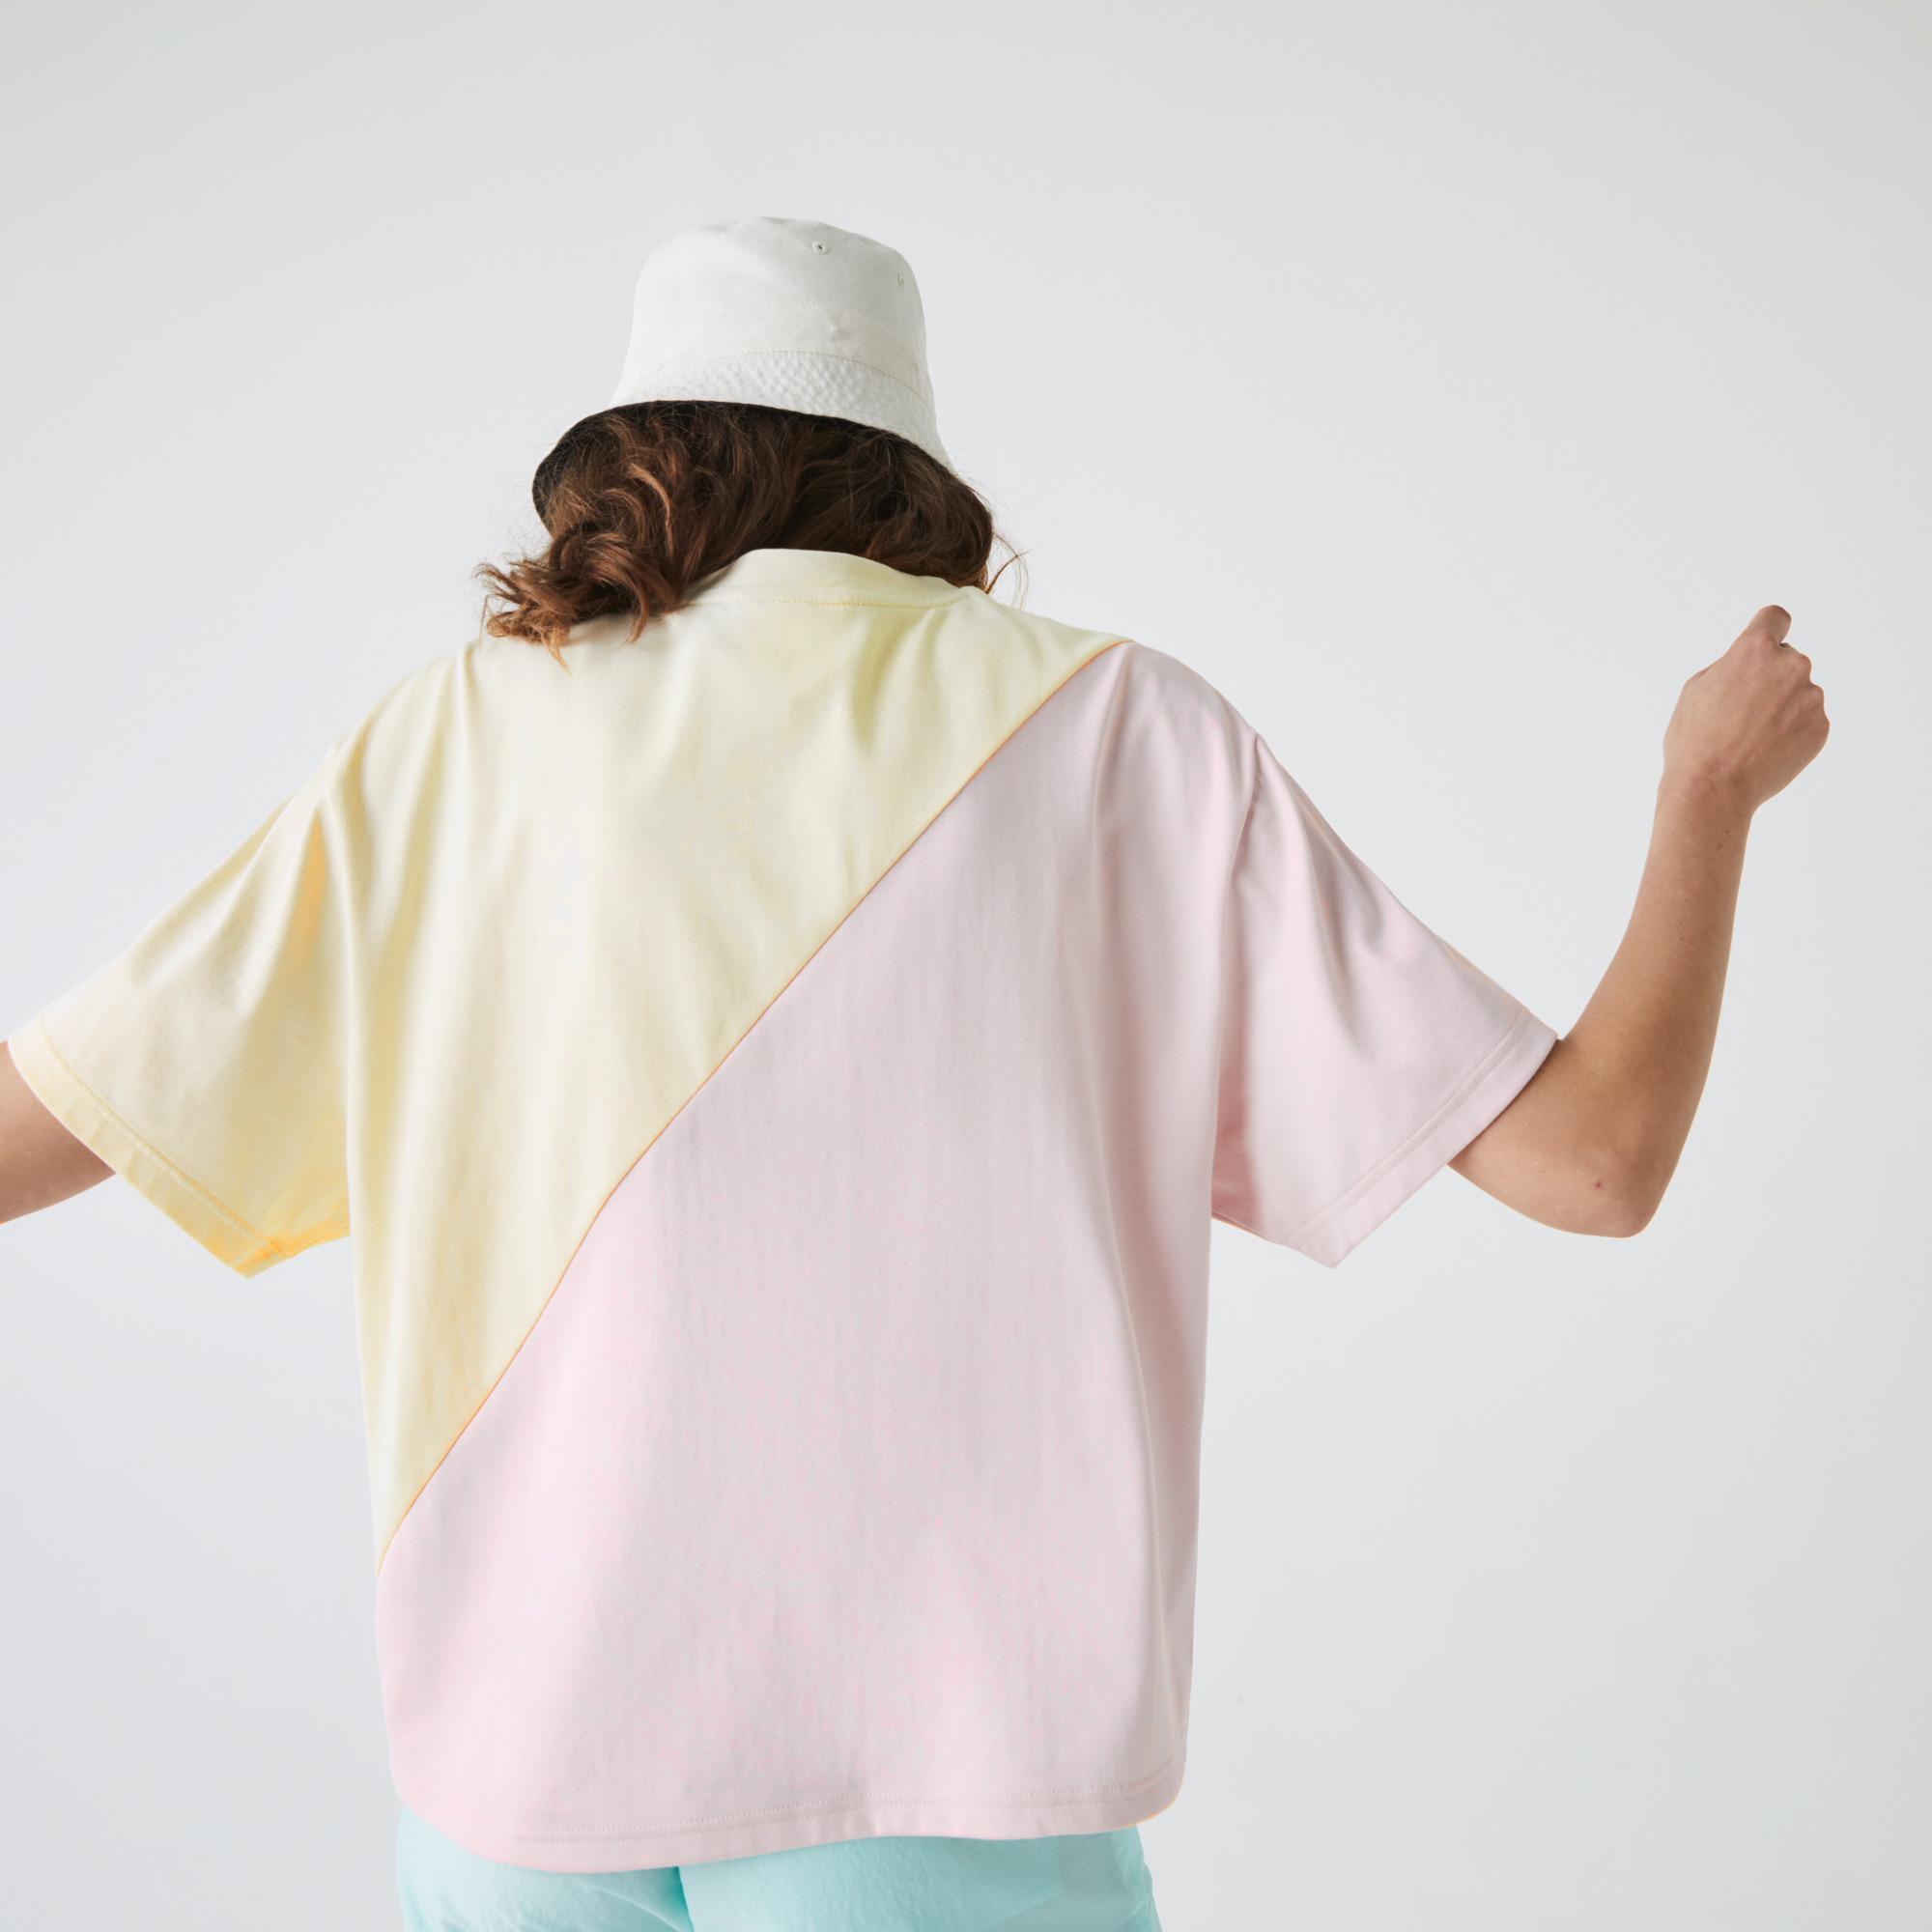 Lacoste футболка жіноча LIVE